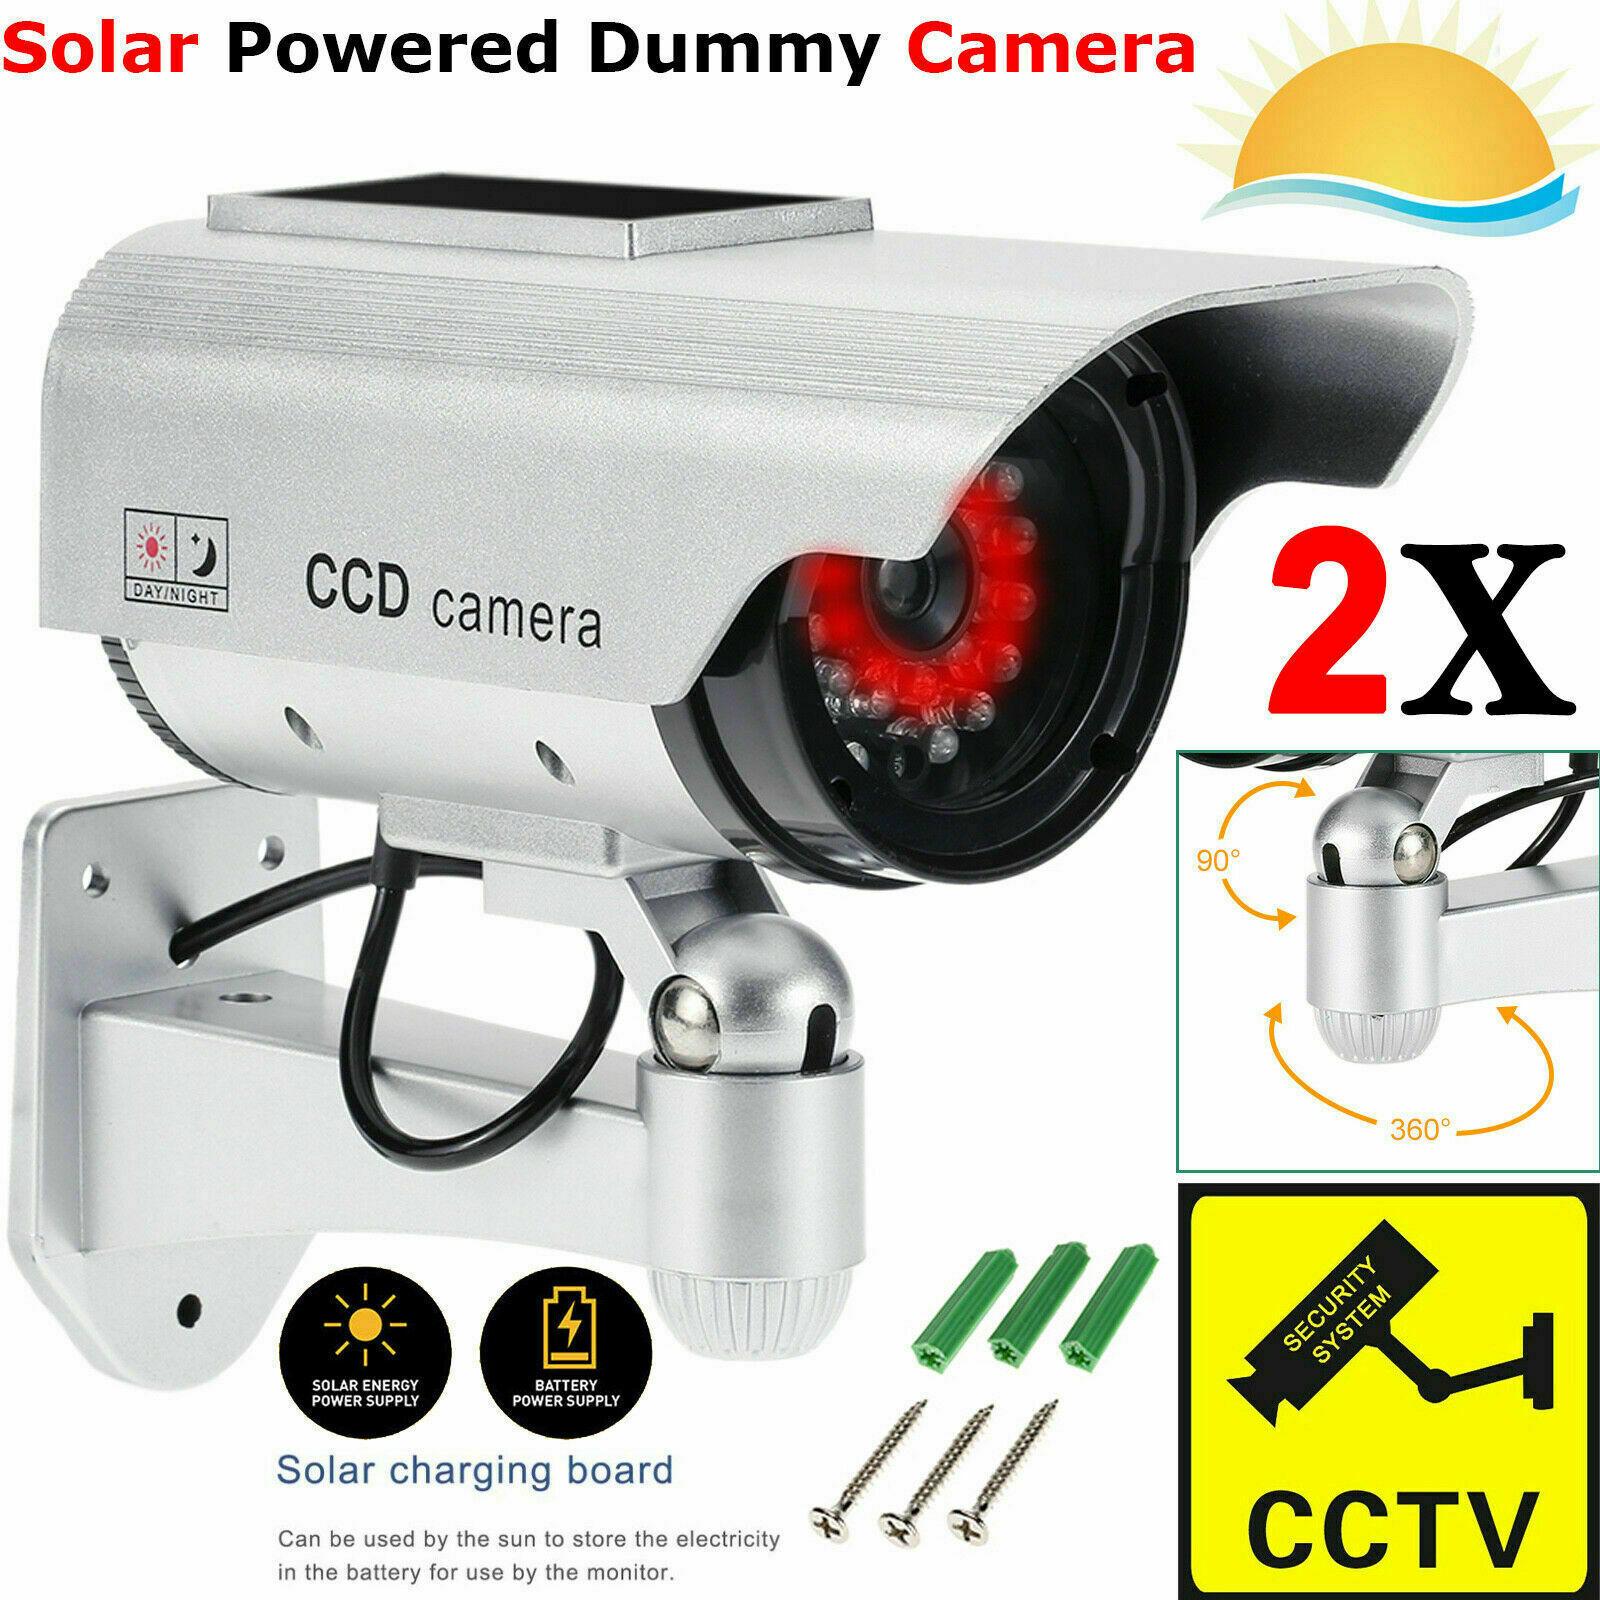 4 Pack Dummy Surveillance Security Camera CCTV W// LED Record Light